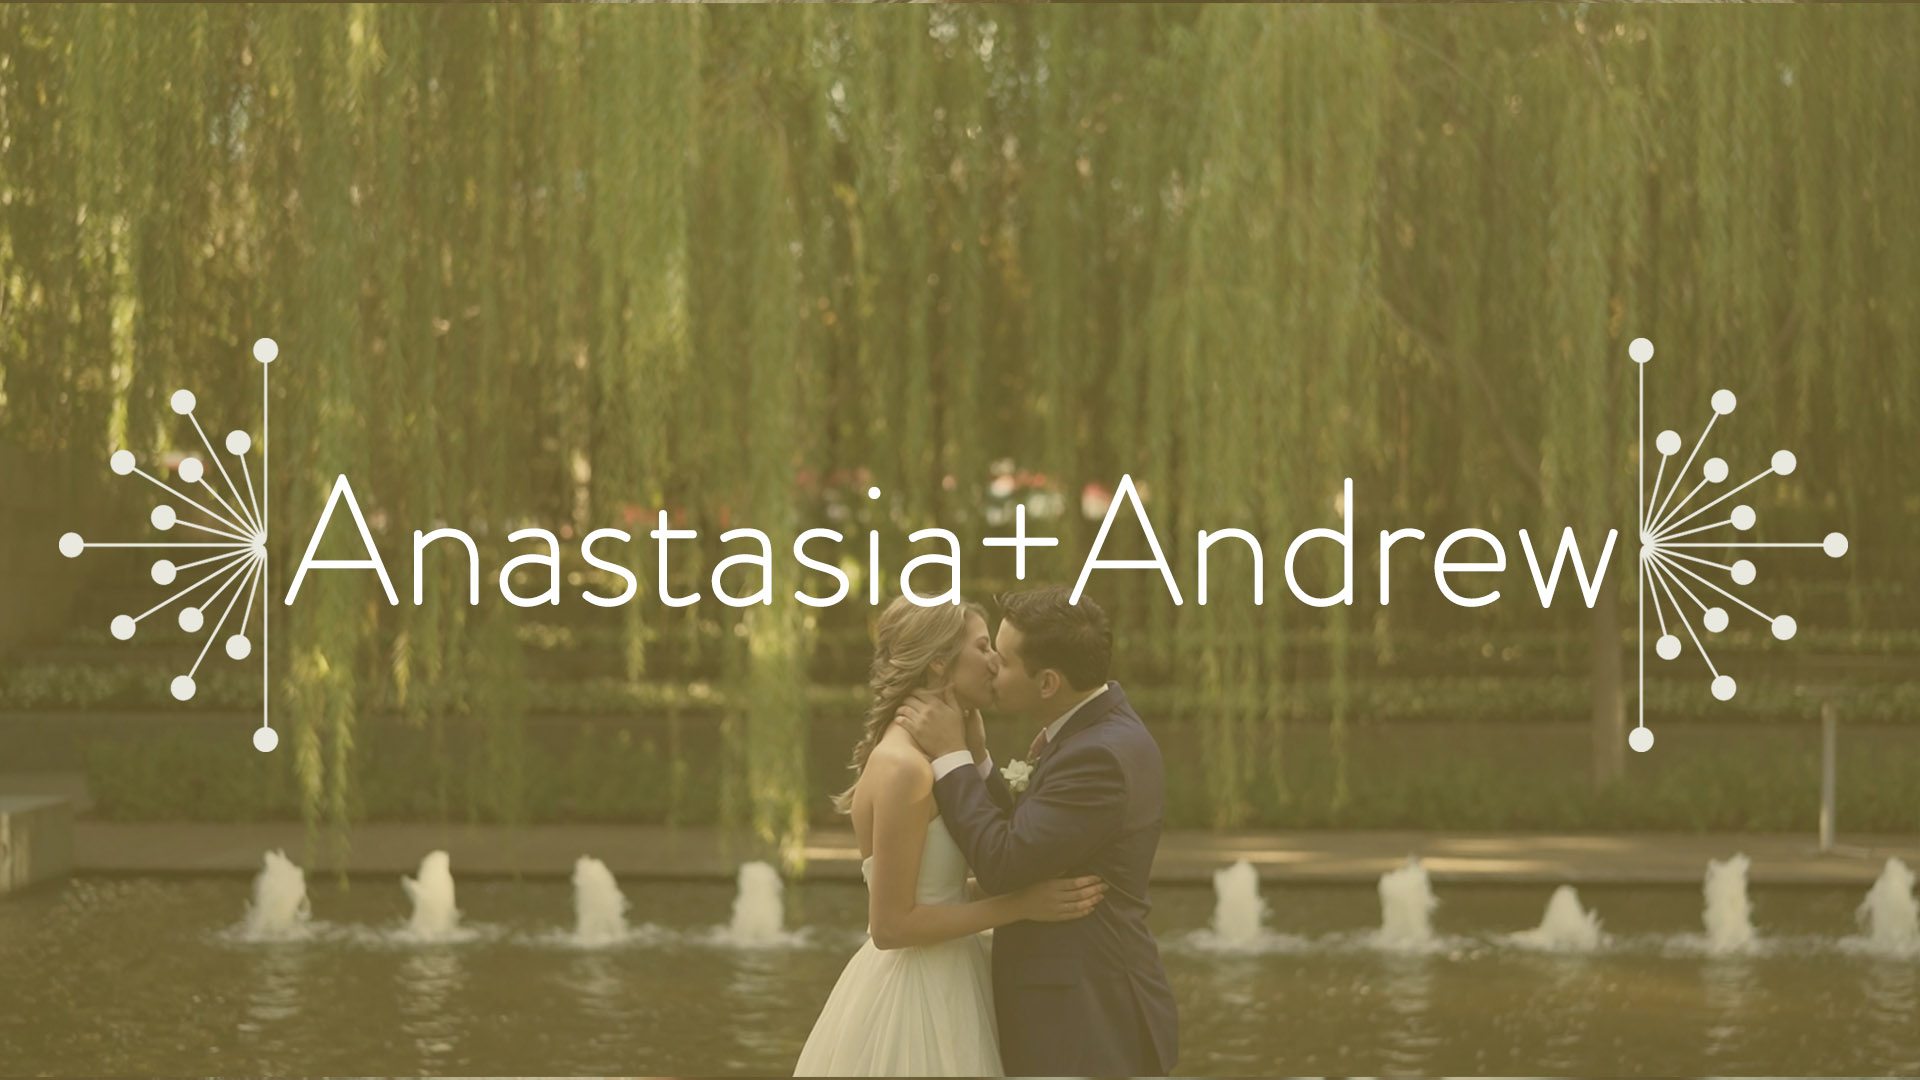 Anastasia + Andrew | Dallas, Texas | Nasher Sculpture Center